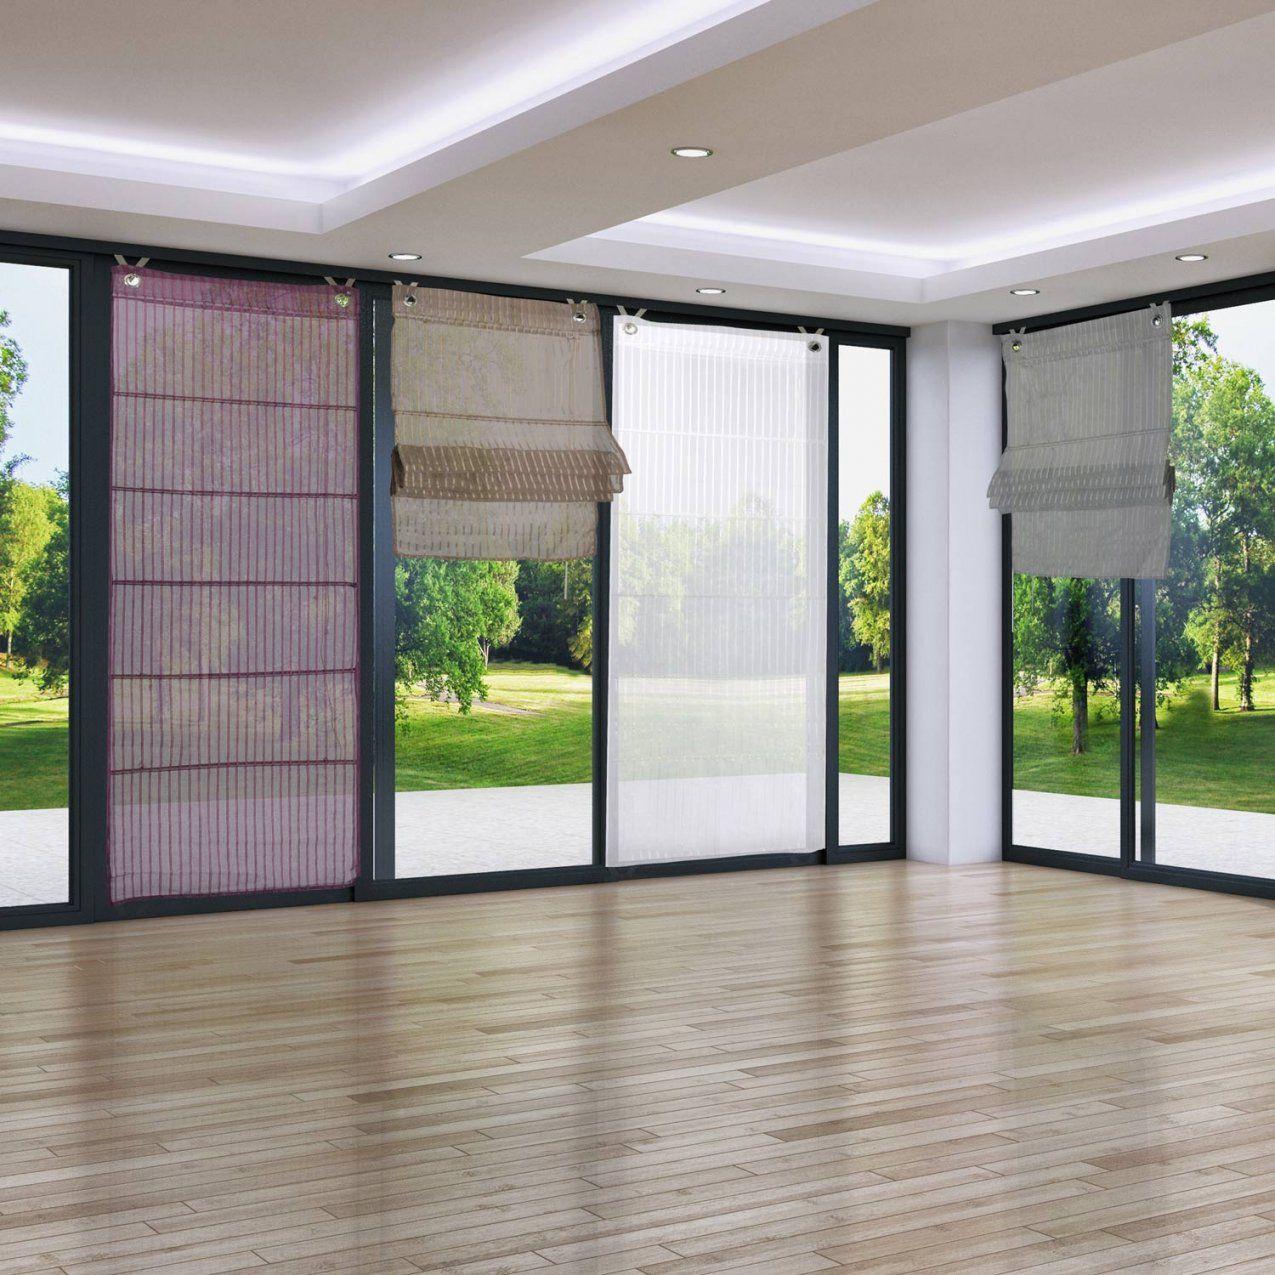 gardinen aufh ngen ohne bohren haus design ideen. Black Bedroom Furniture Sets. Home Design Ideas